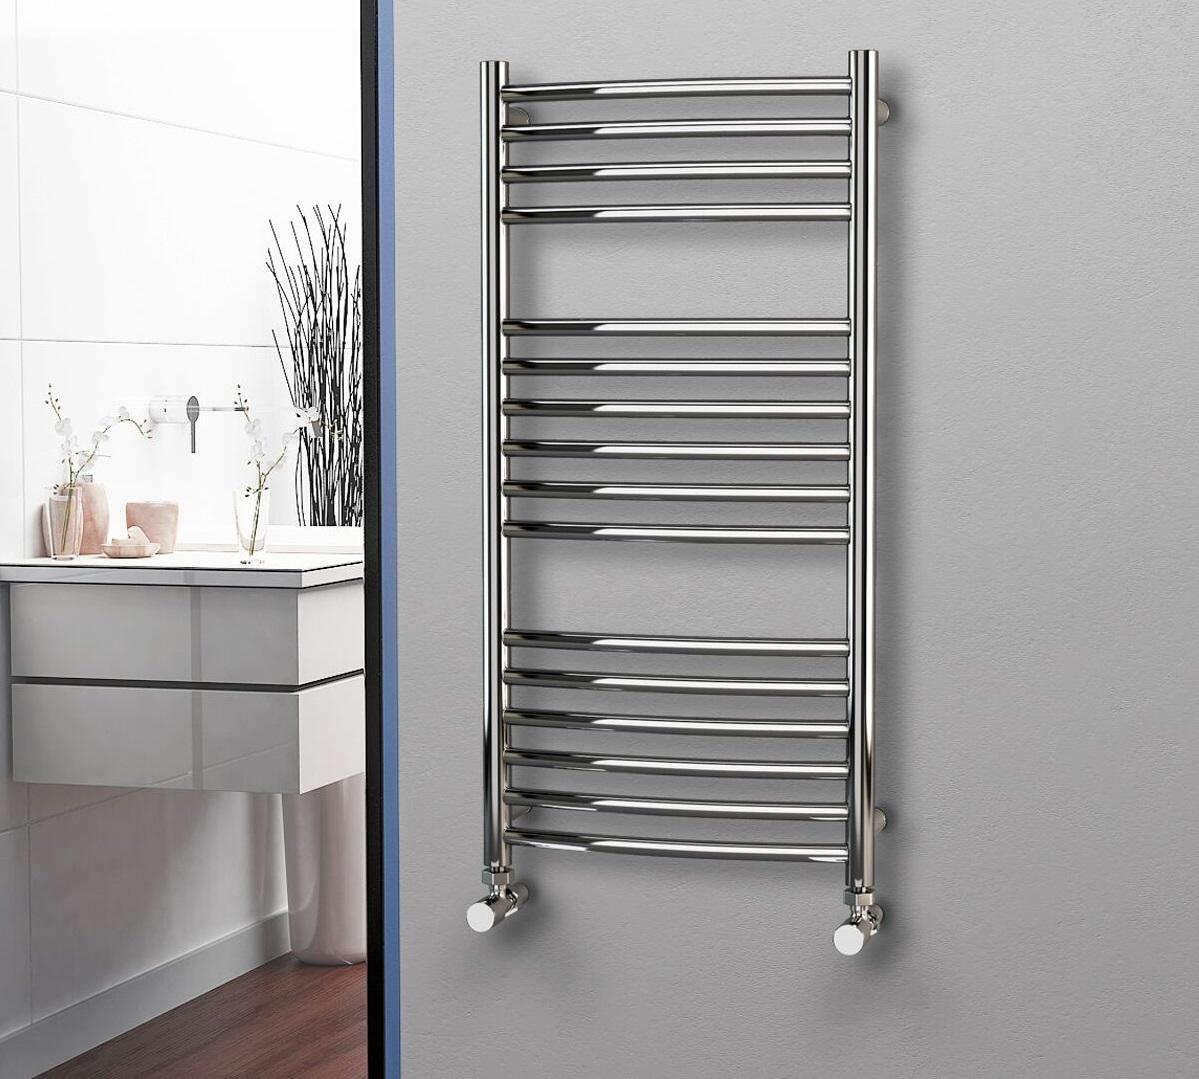 Steel heating radiators: types, characteristics and advantages of batteries 5